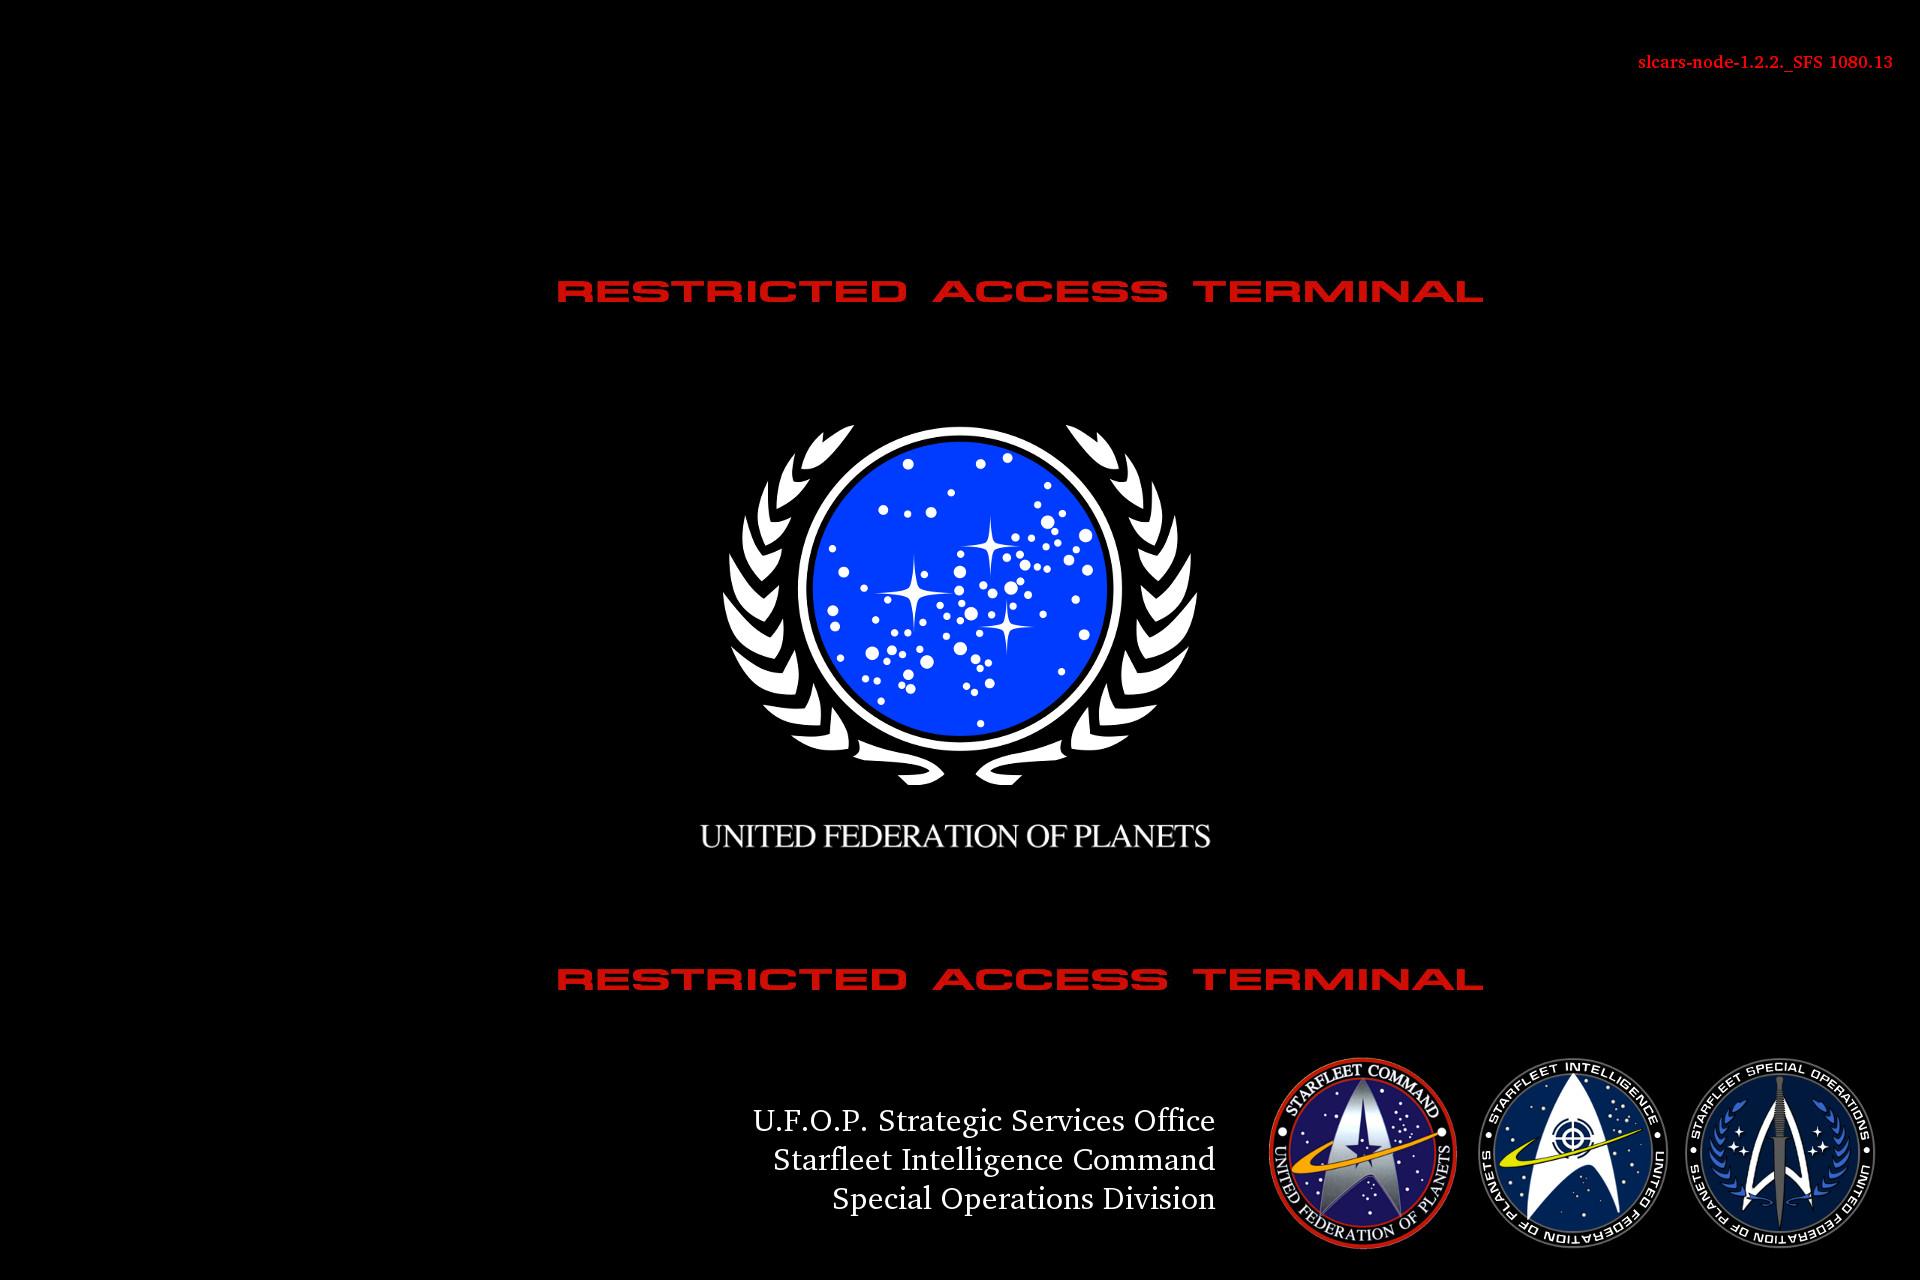 Iphone X Wallpaper Official Download Star Trek Padd Ipad Wallpaper 59 Images